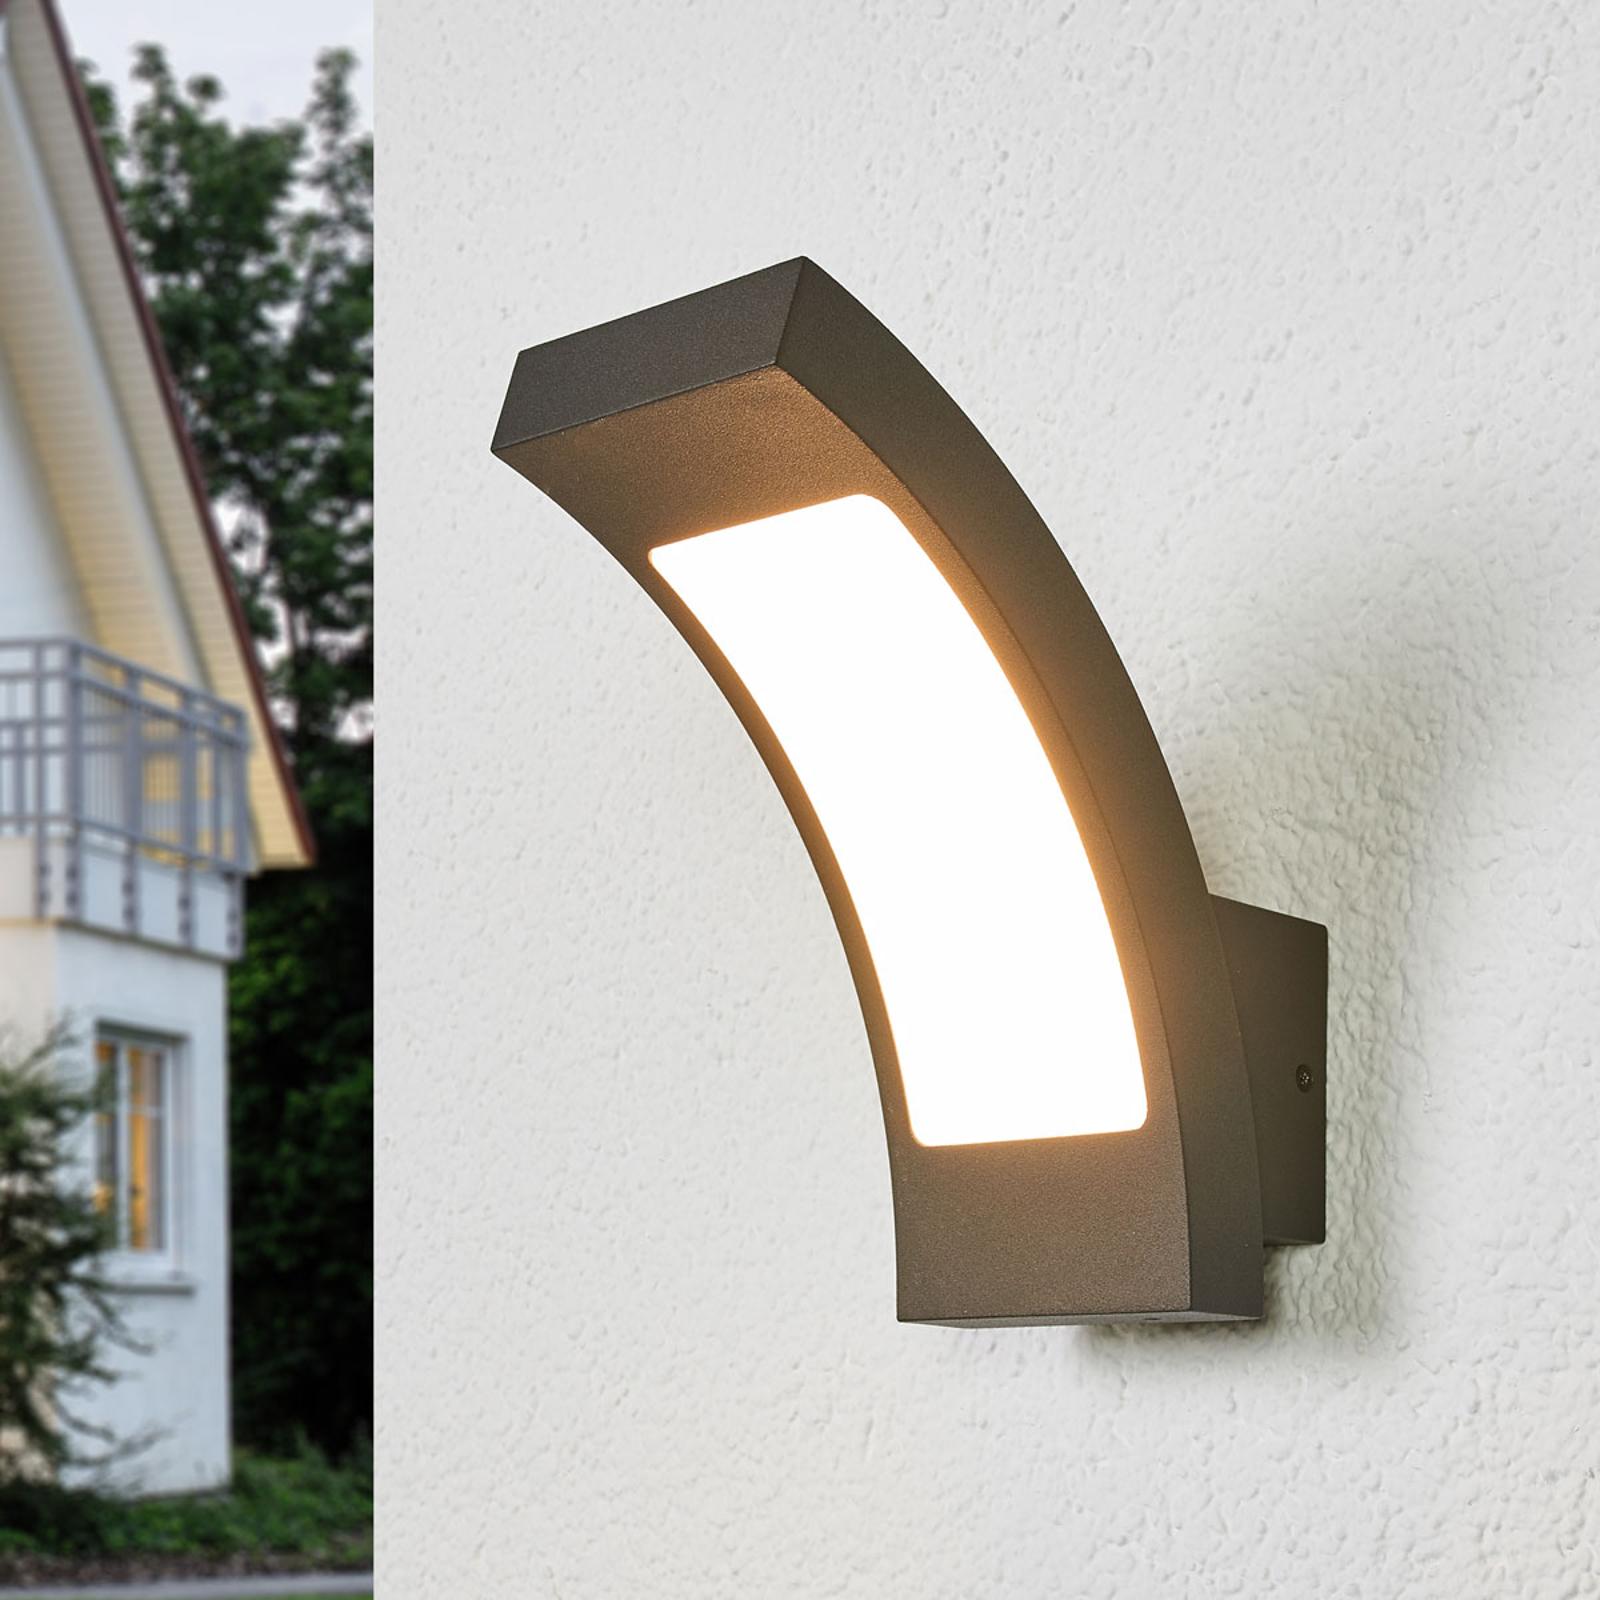 Grafitgraue LED-Außenwandlampe Juvia, IP54